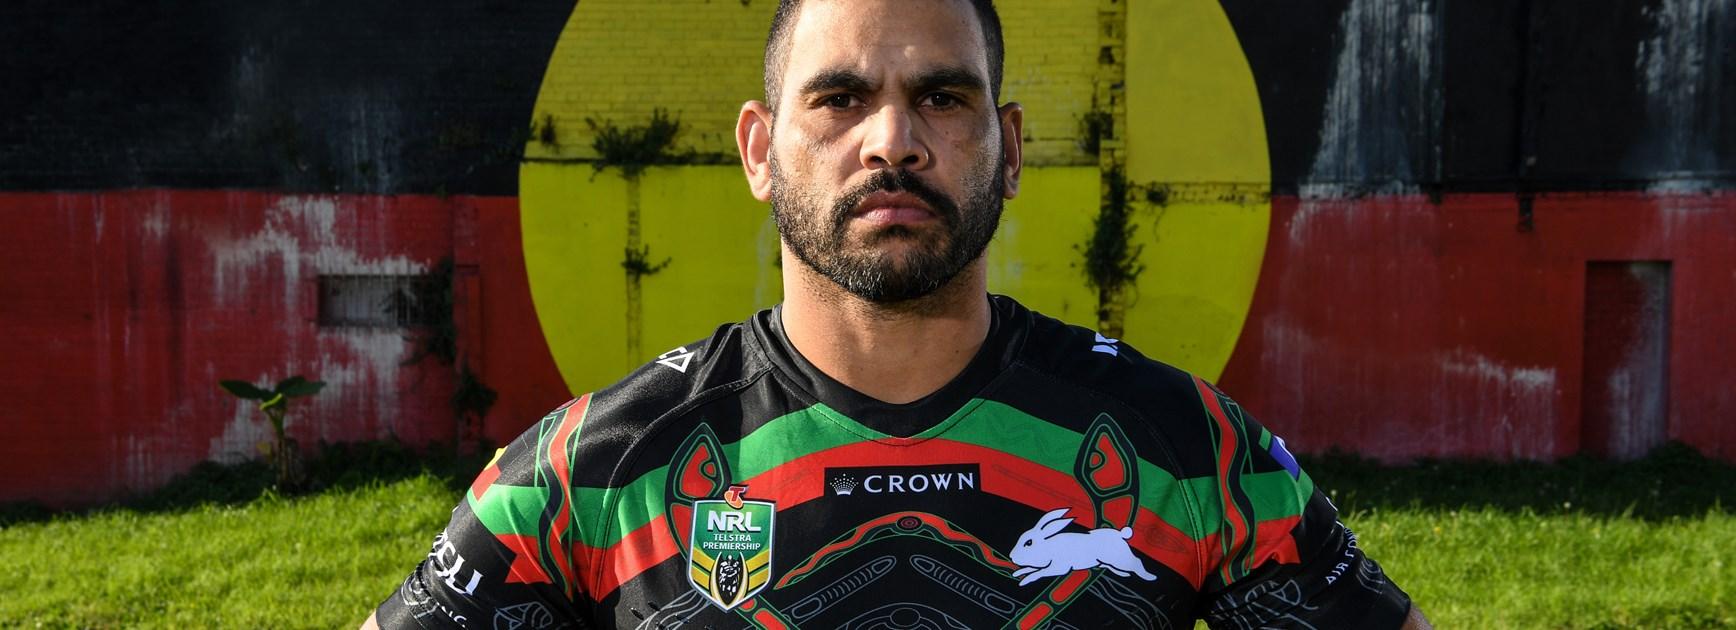 Greg Inglis in the 2018 Rabbitohs Indigenous Round jersey